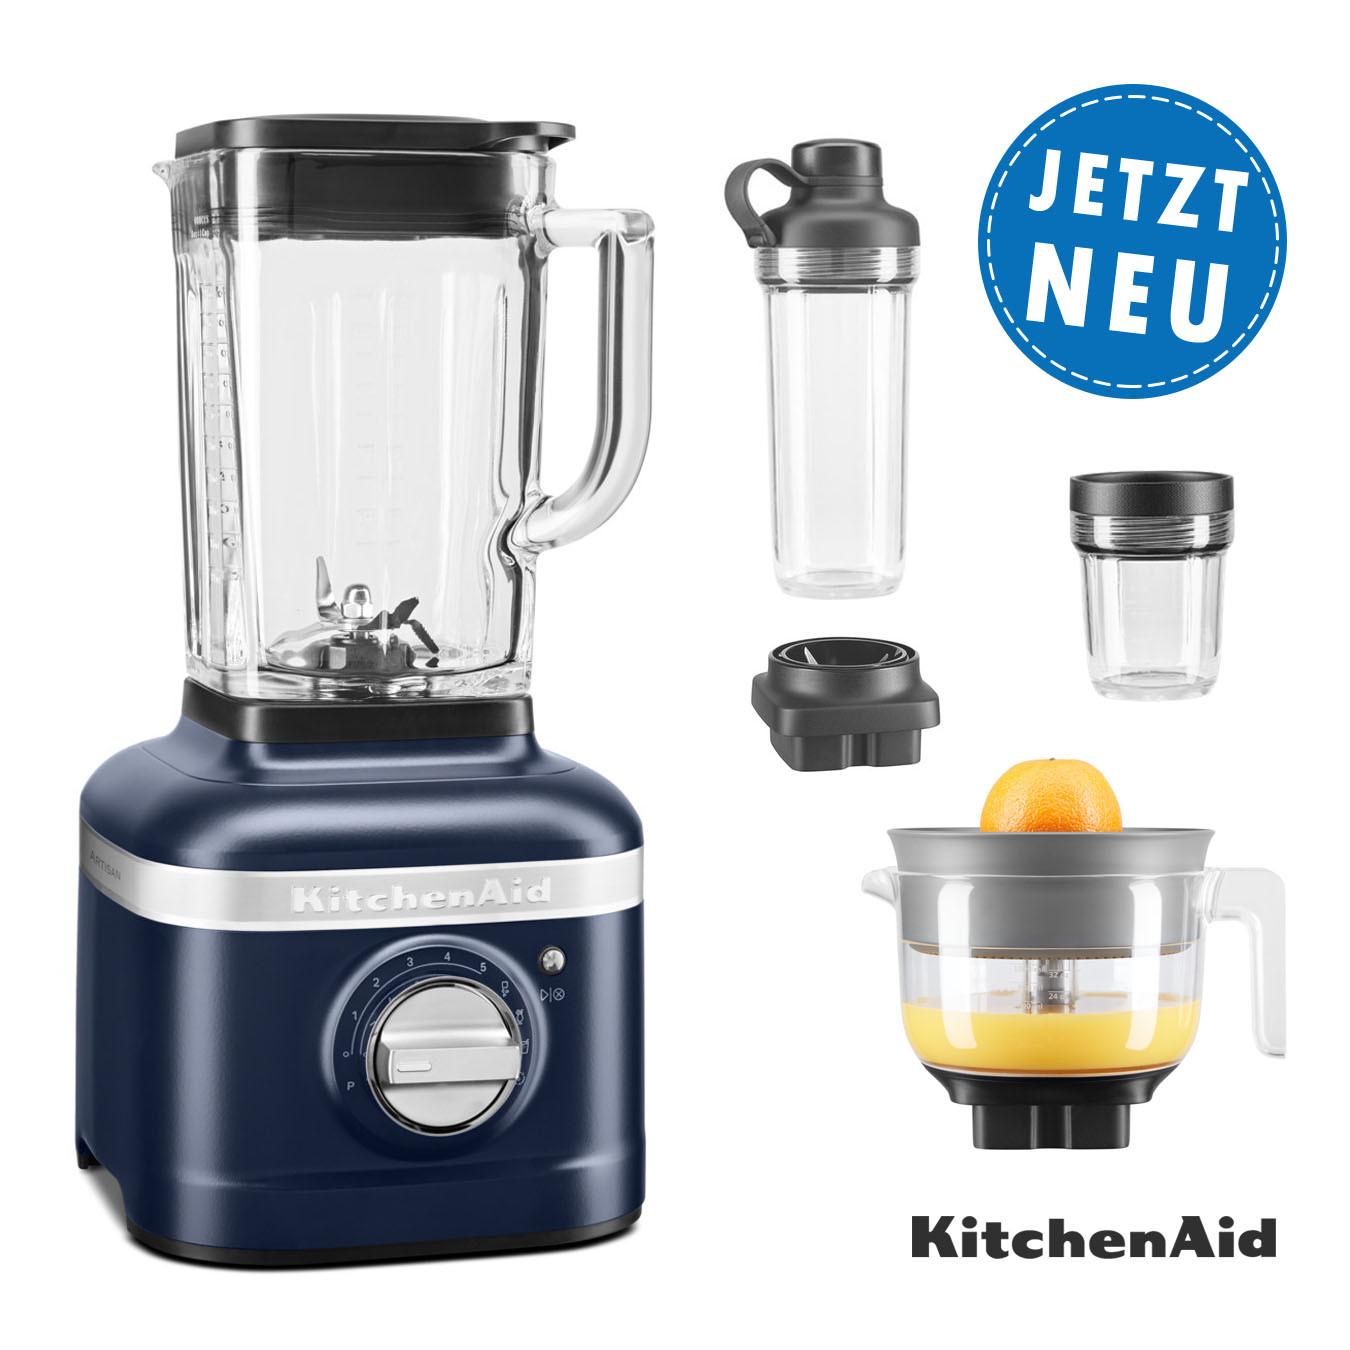 KitchenAid ARTISAN K400 Standmixer 5KSB4026EIB ink blue Sparpaket